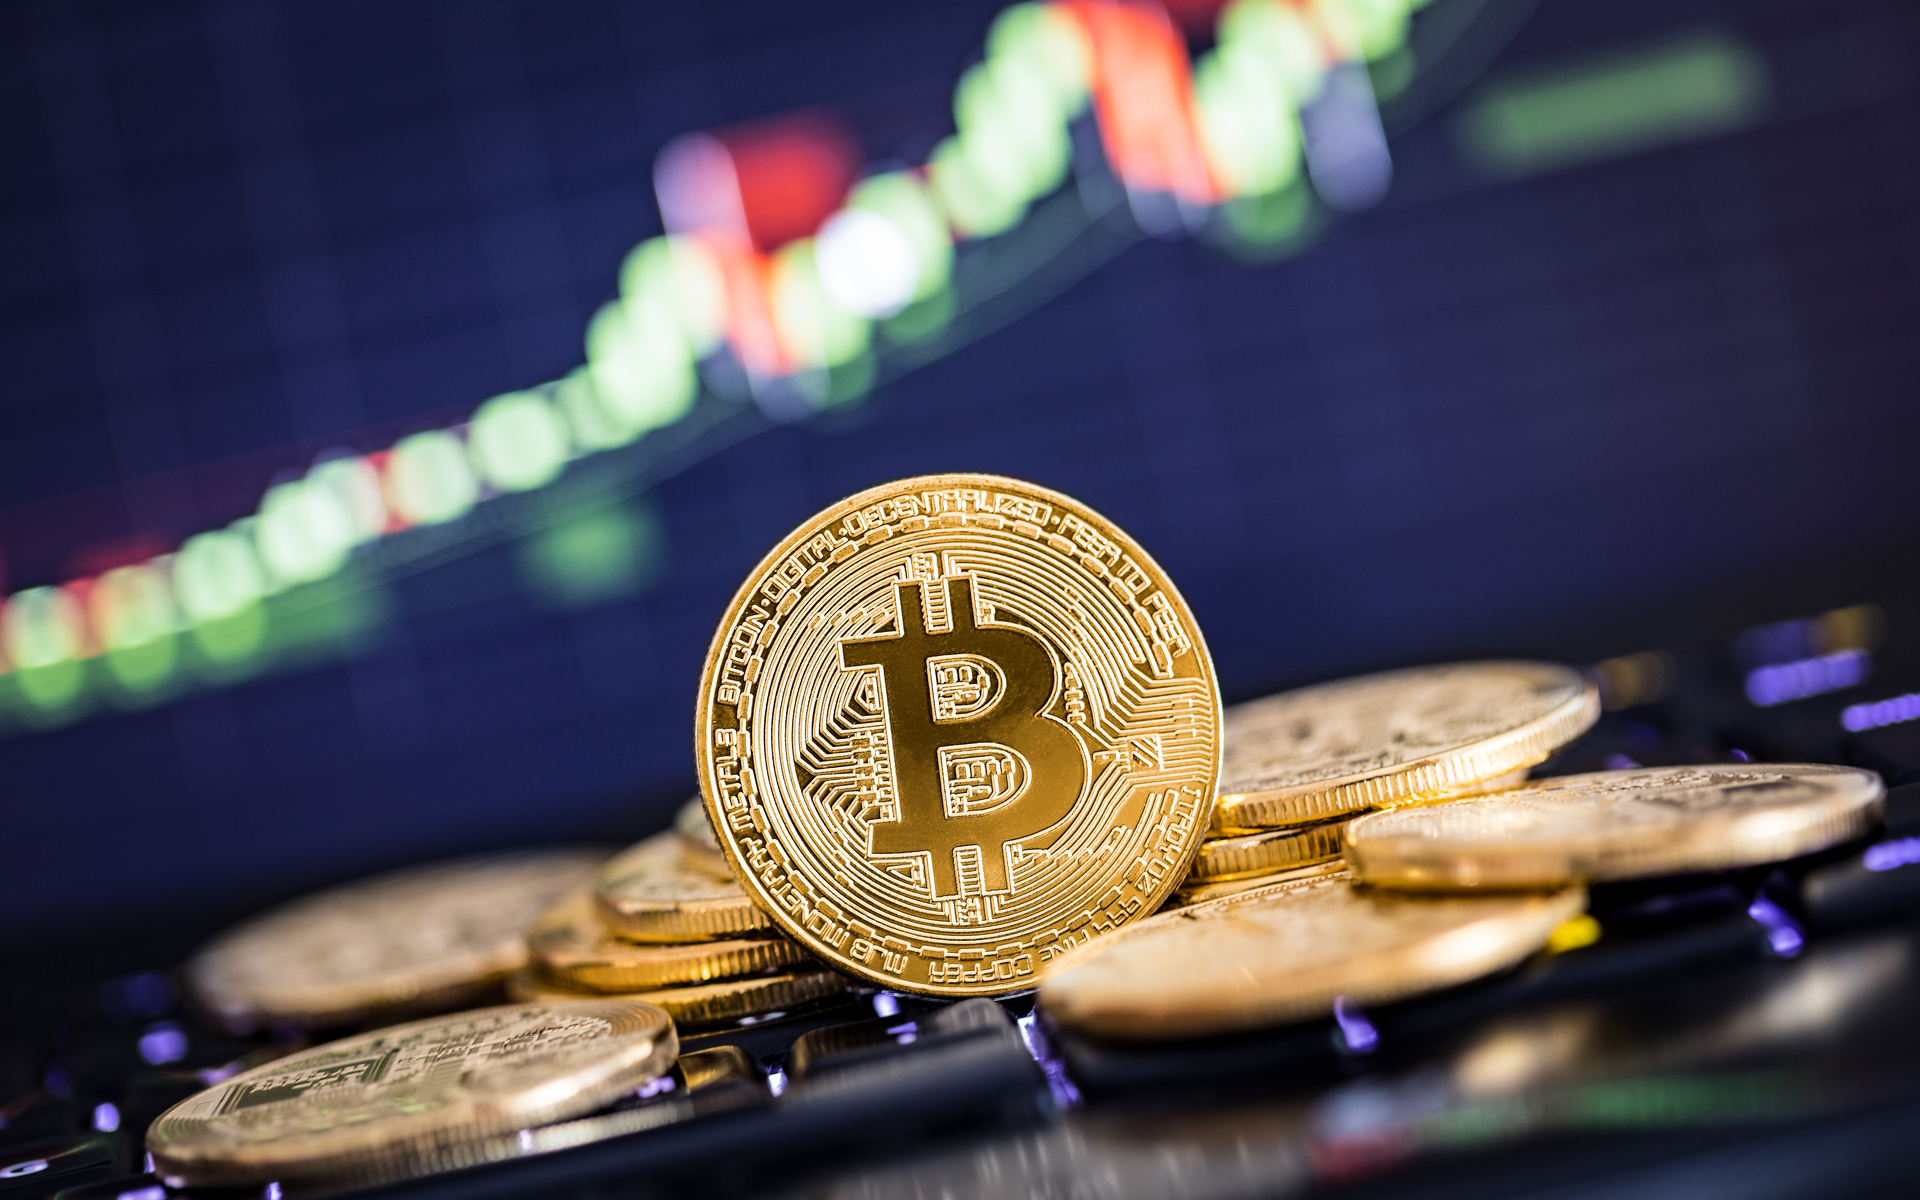 Bitcoin Trading on BitcoinCode